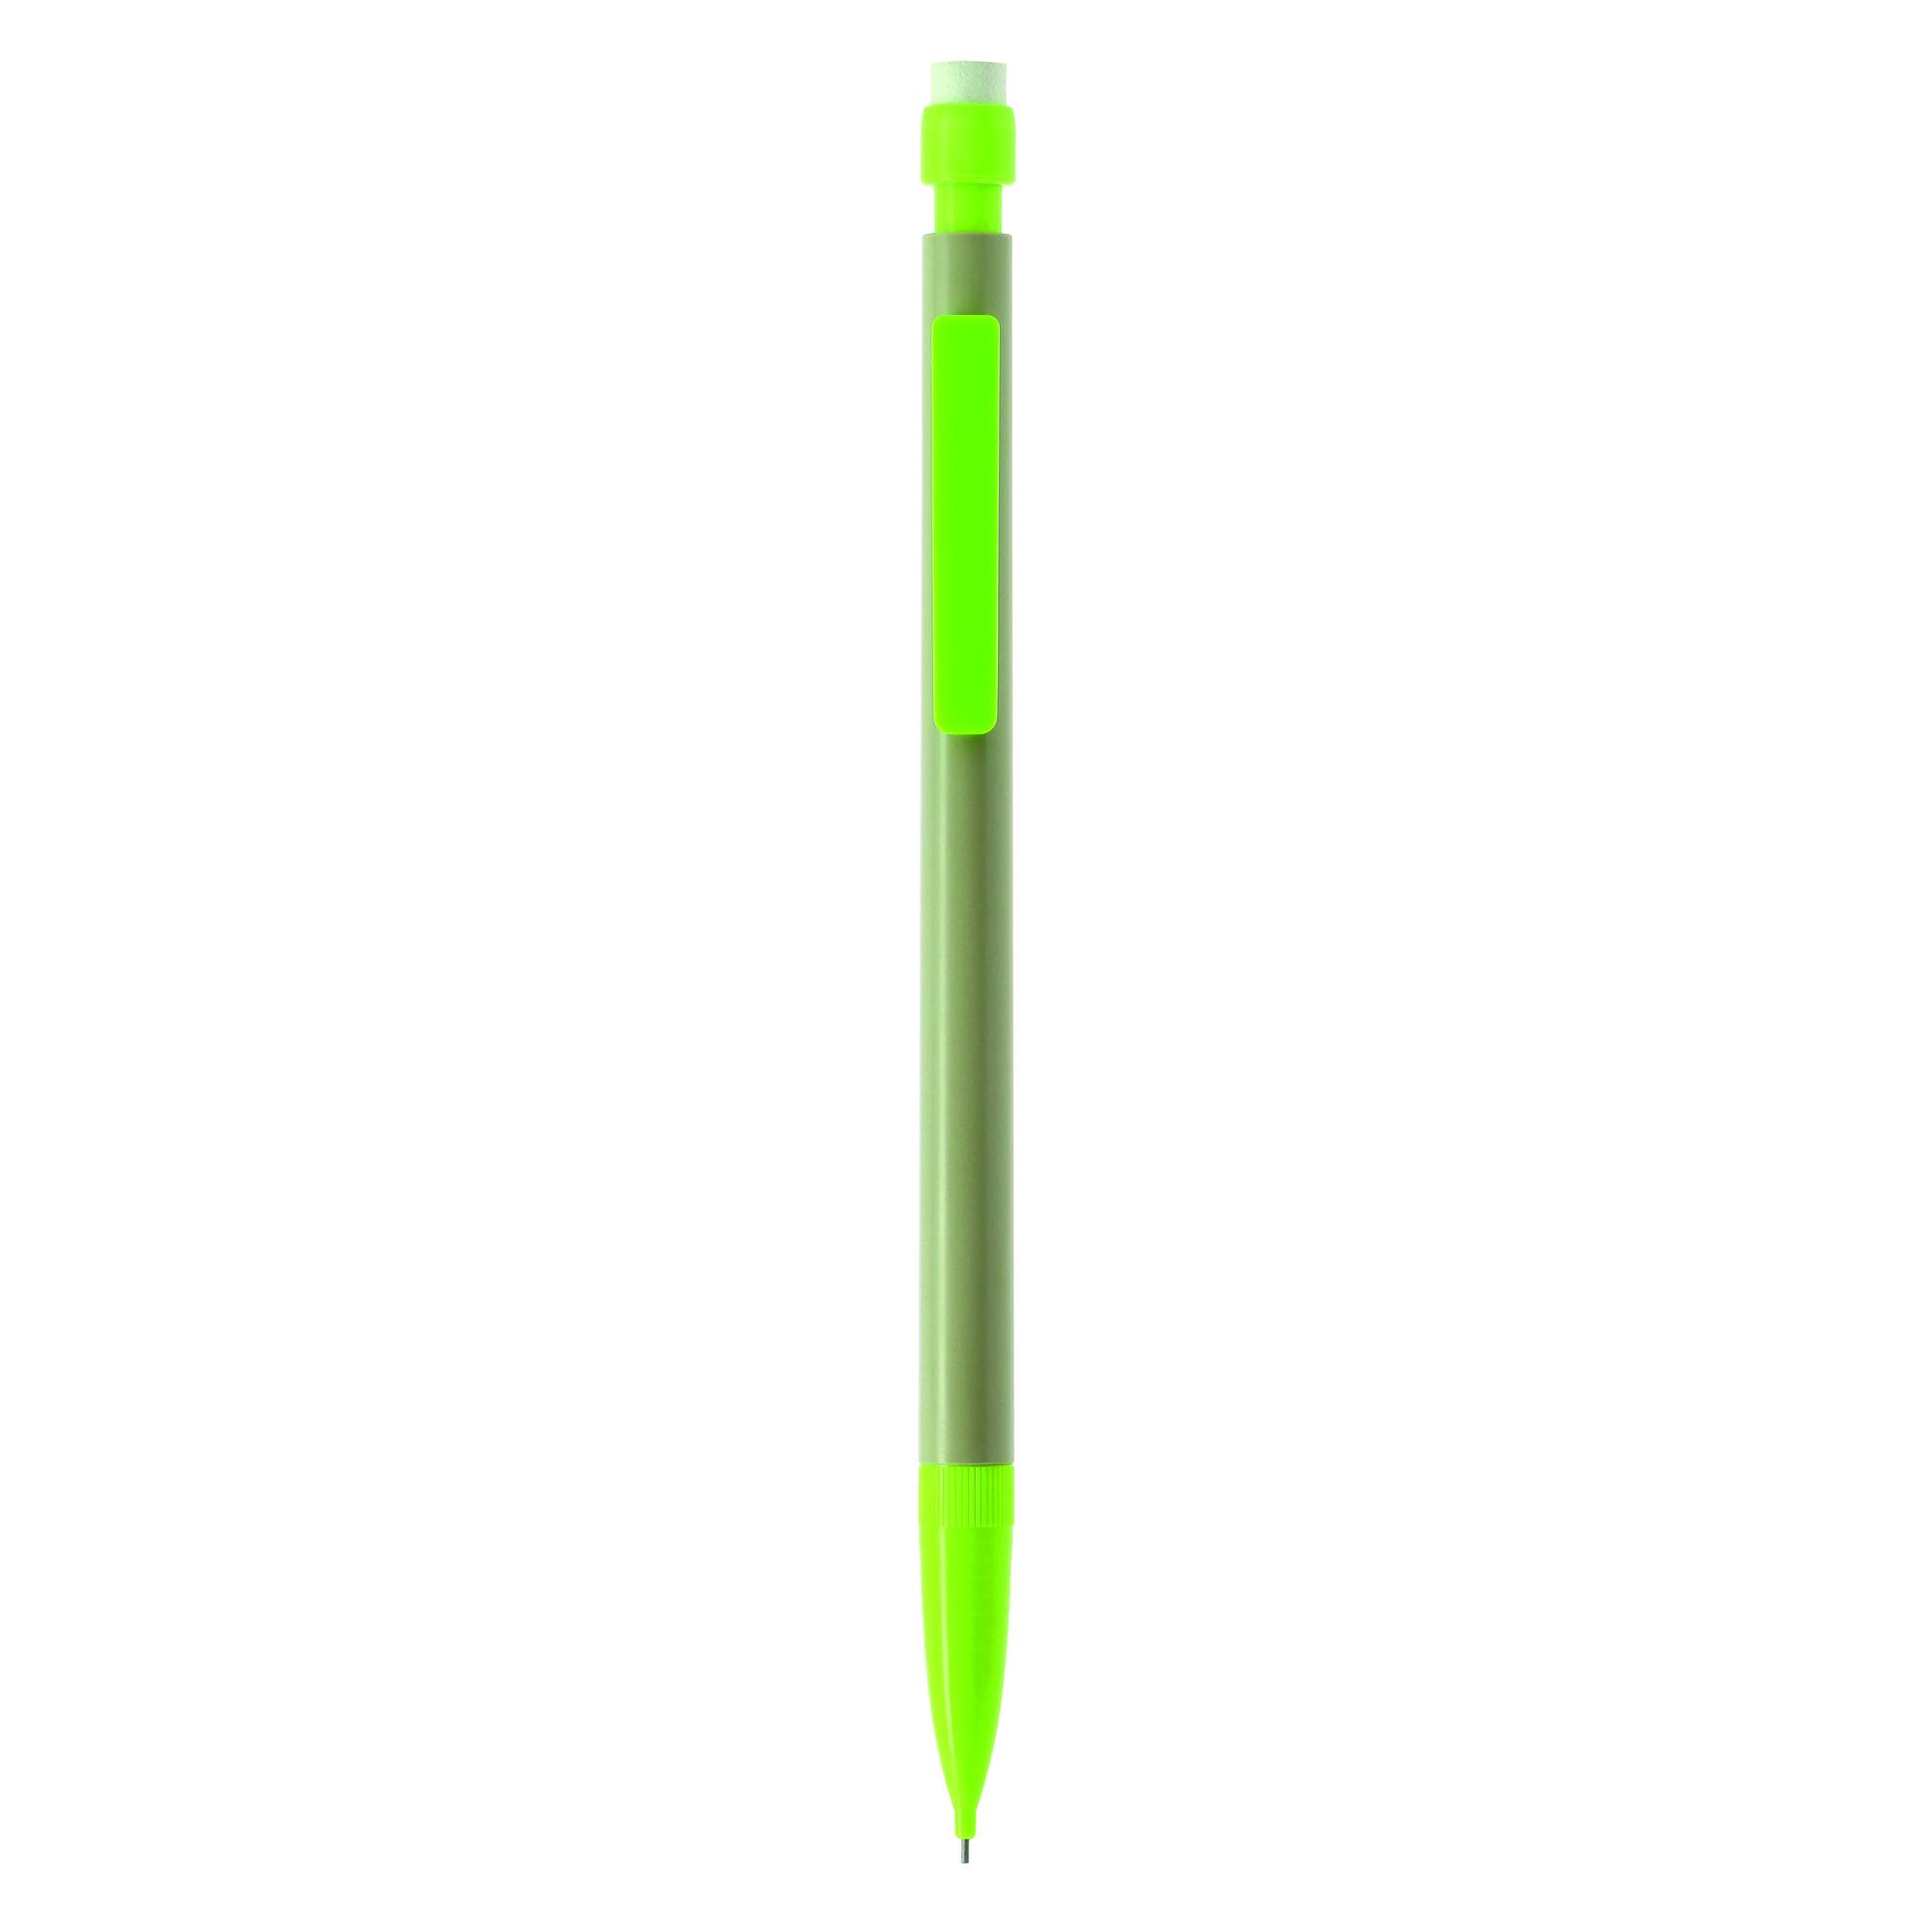 BIC® Matic® Ecolutions® porte-mine - 10-1053-24